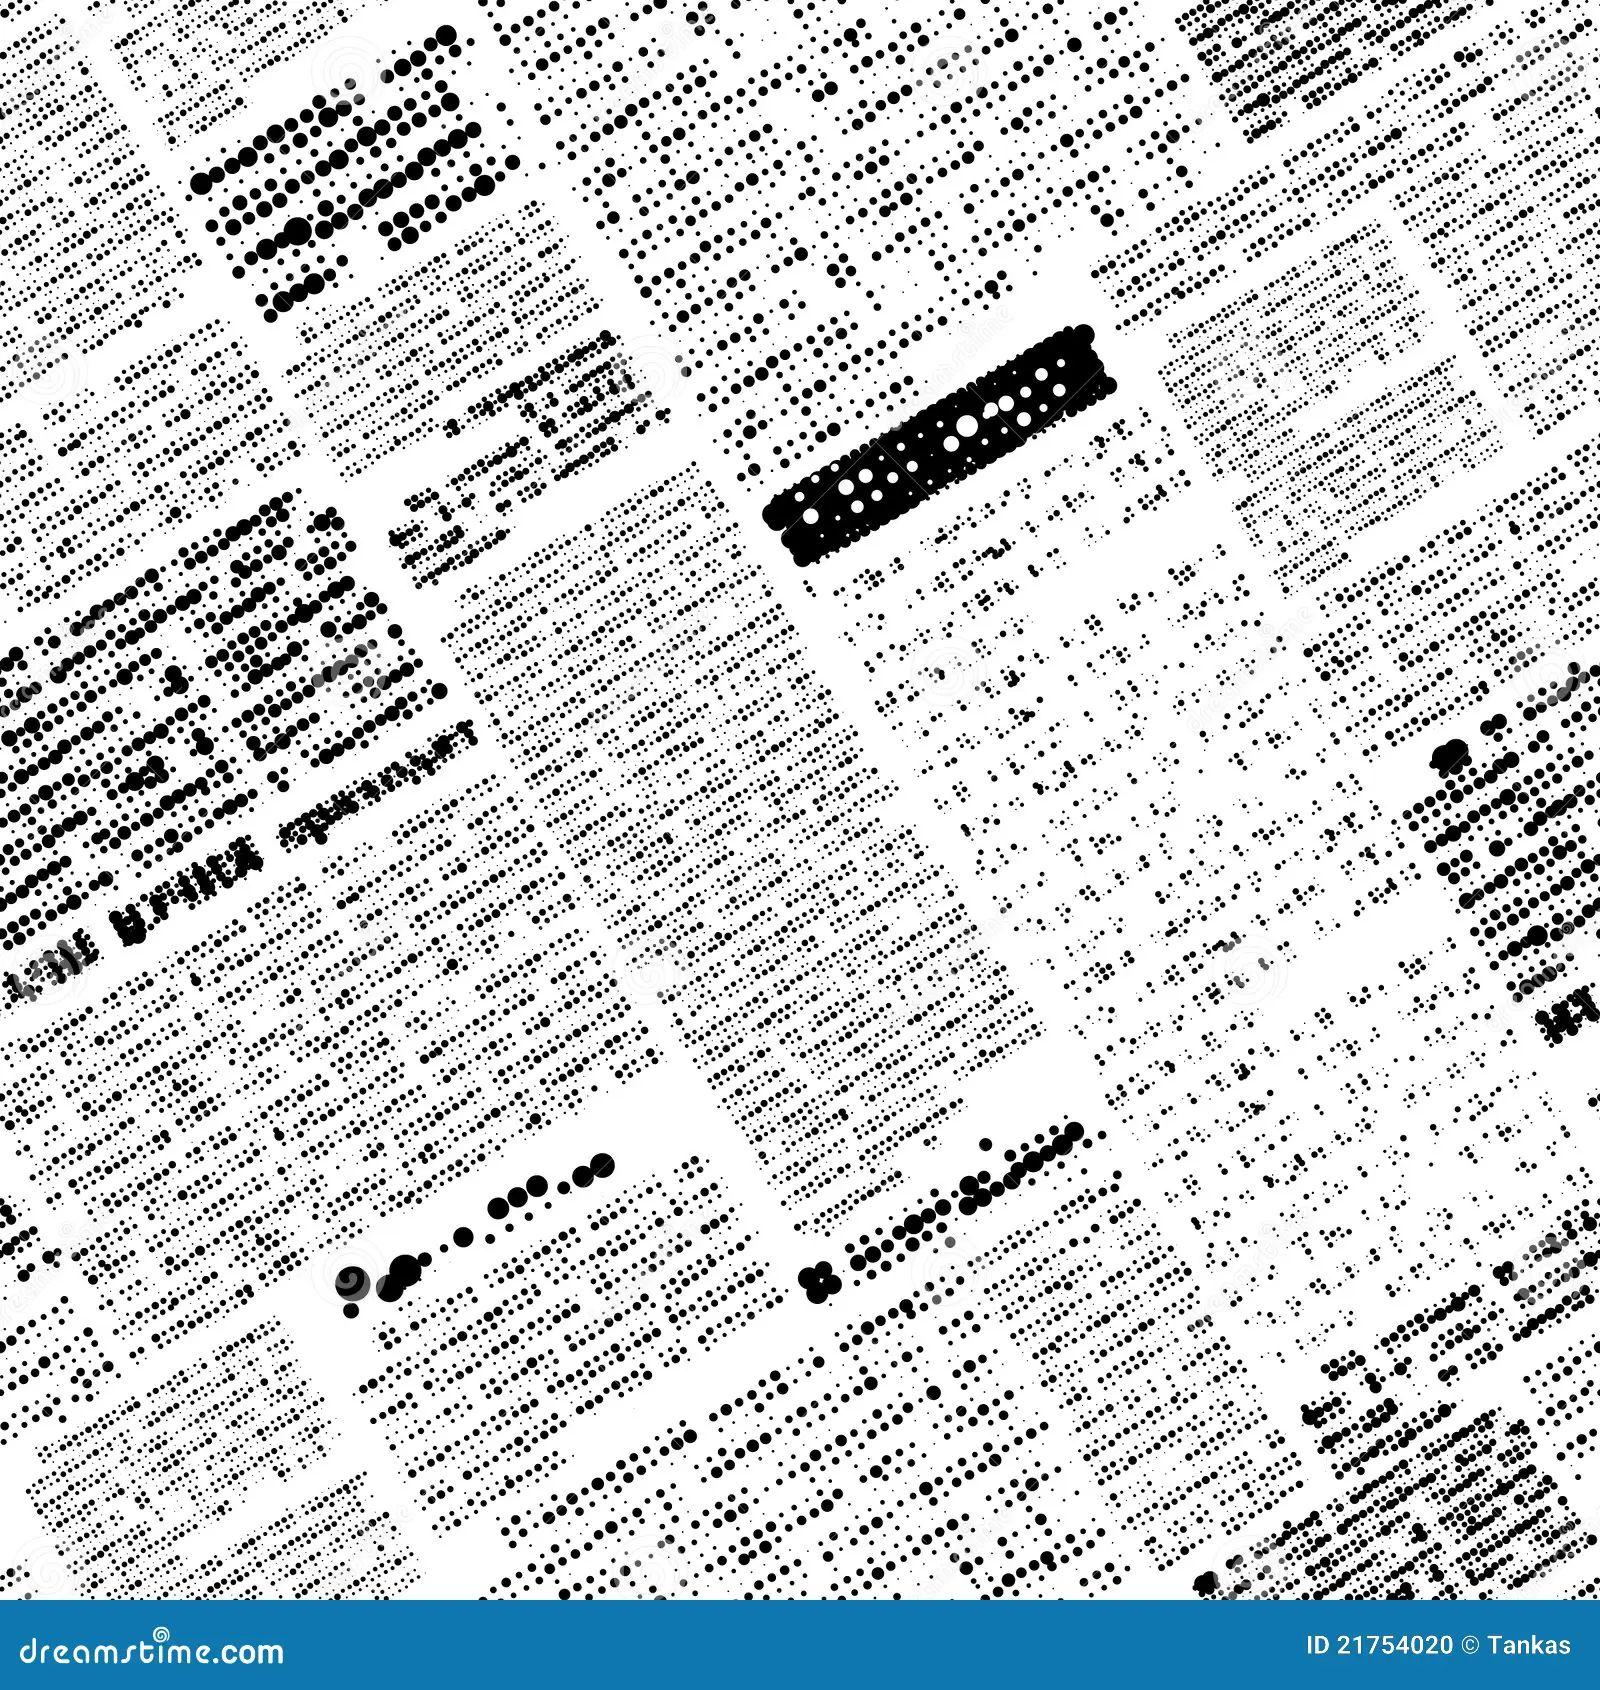 newspaper outline